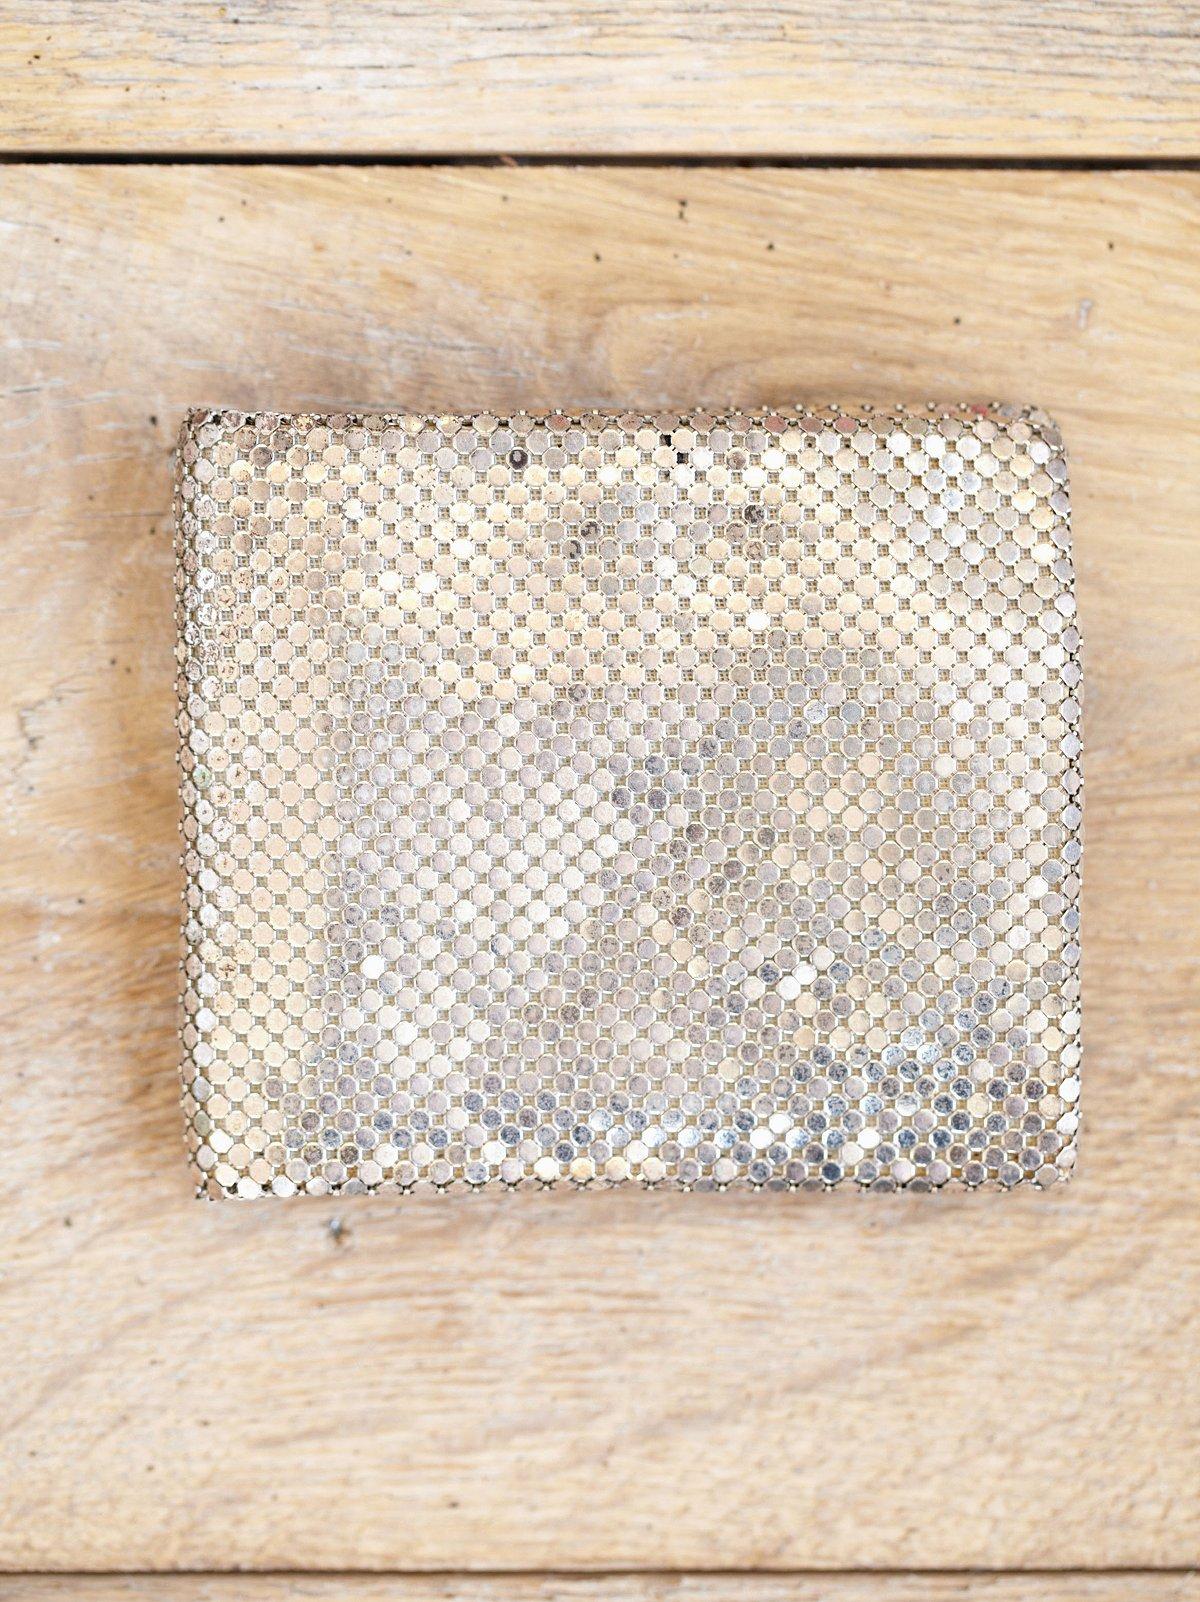 Vintage Chainmail Wallet